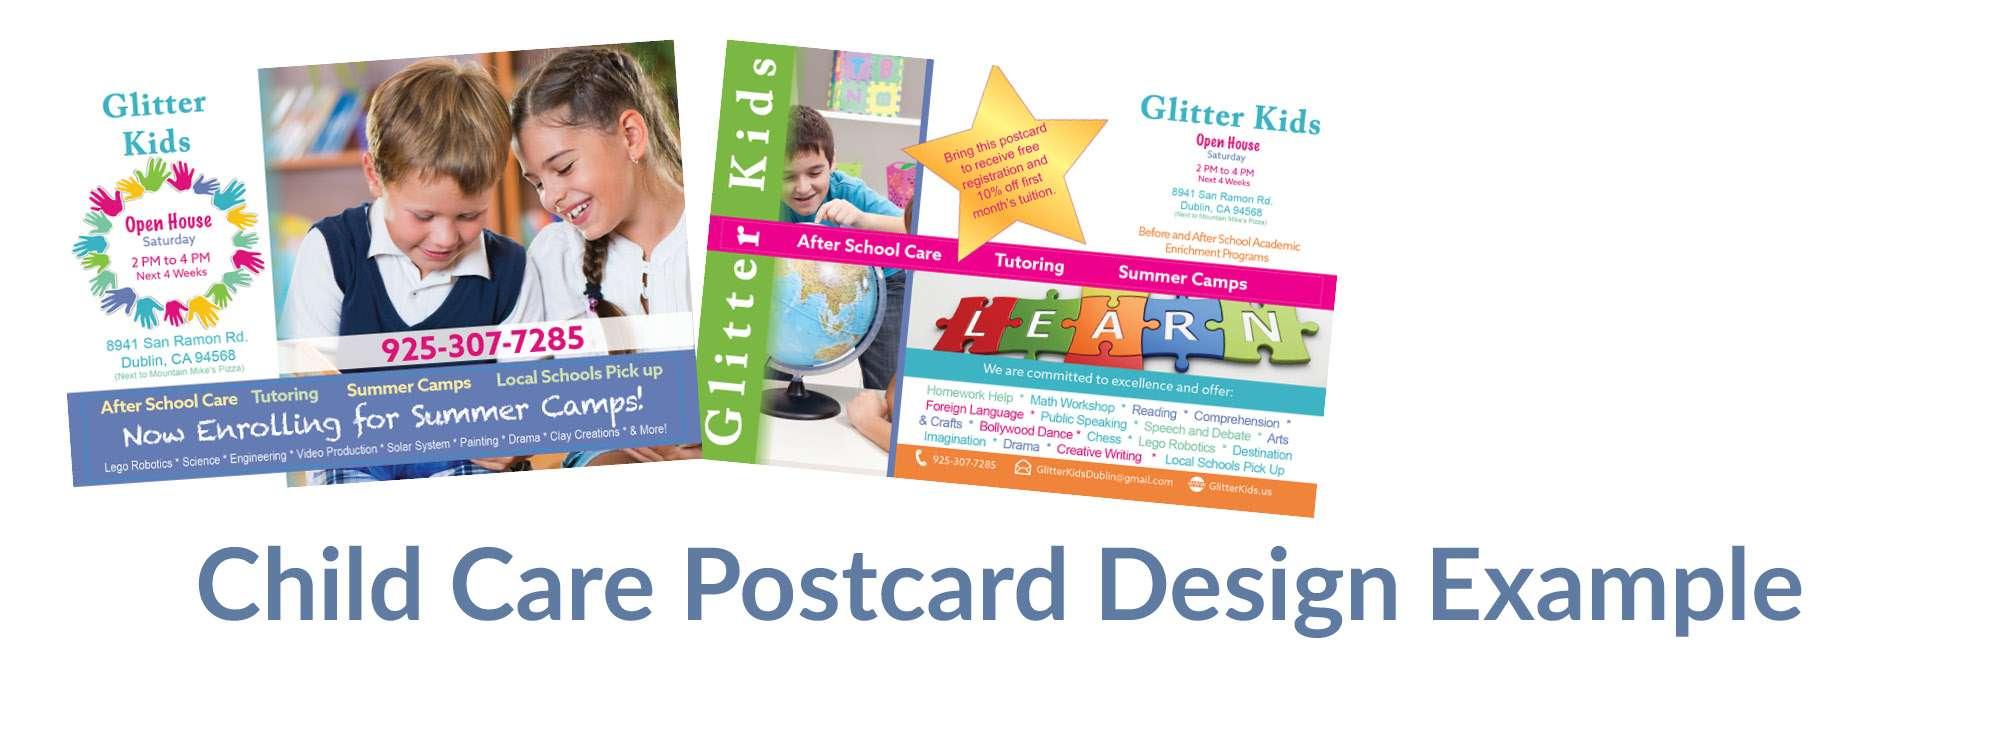 Child Care Postcard Design Example